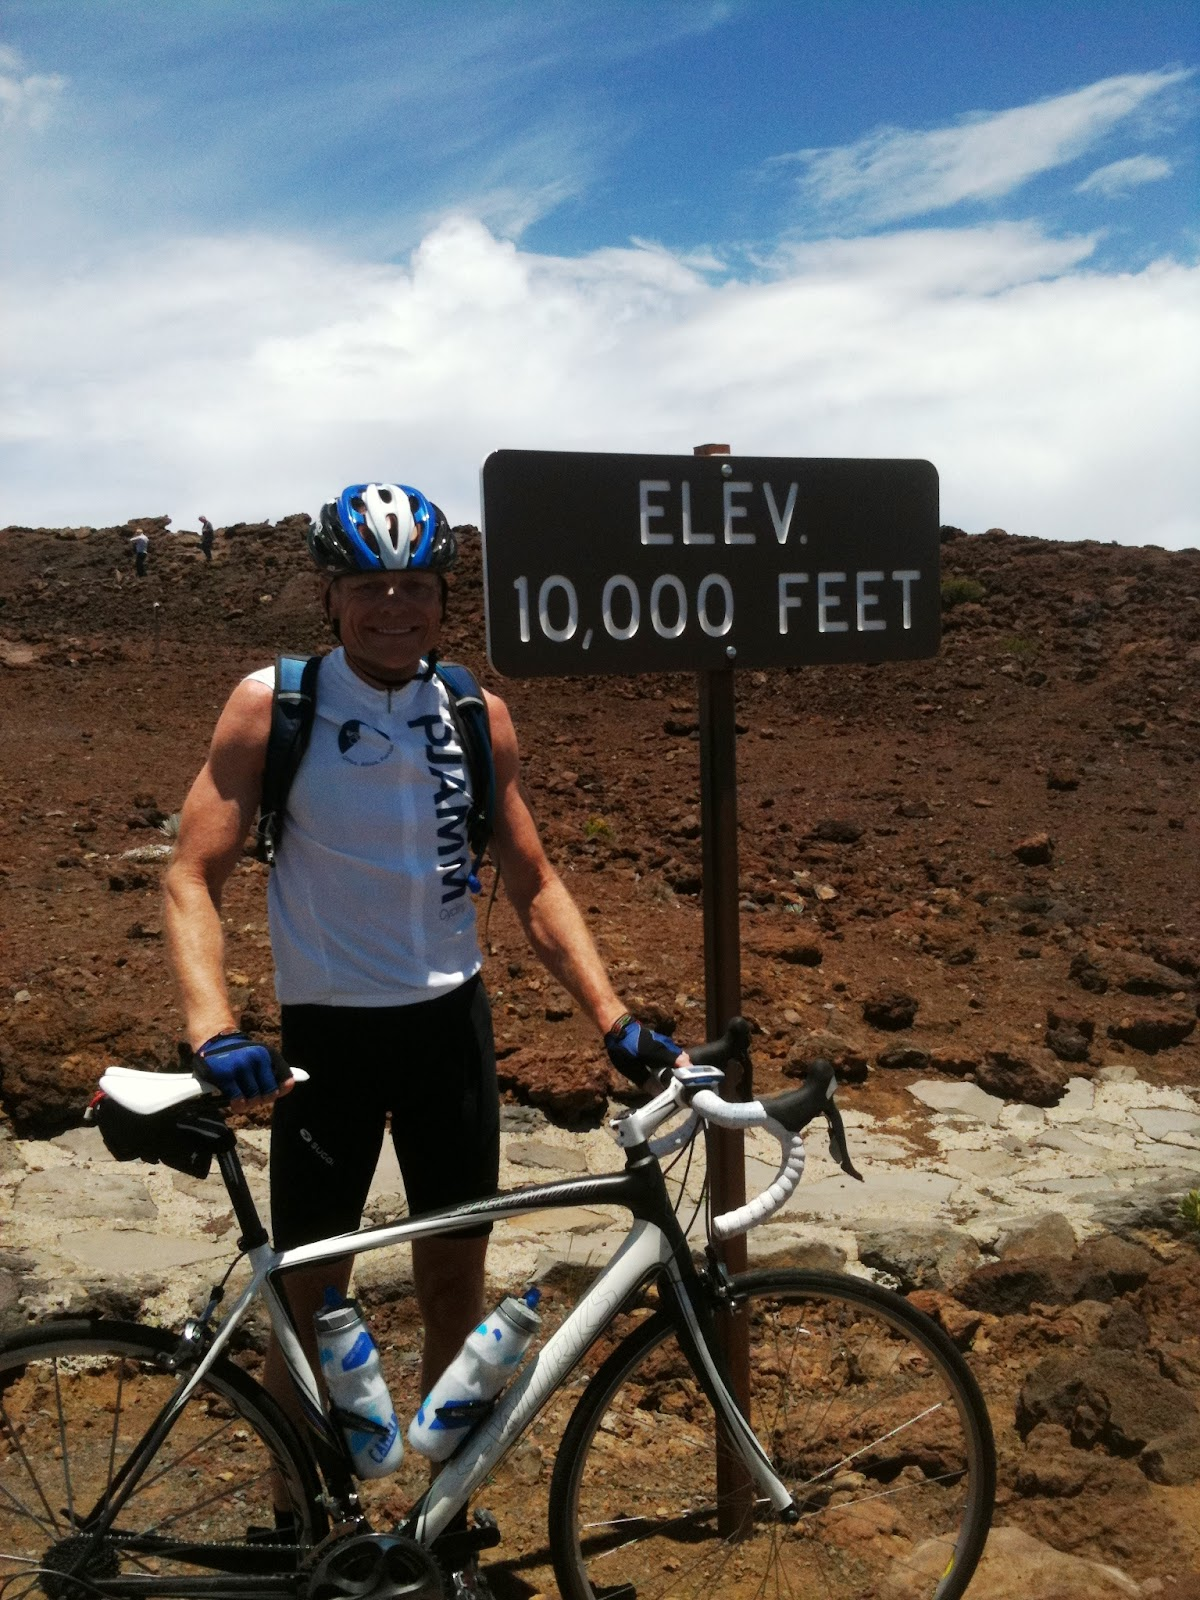 Climbing Haleakala Volcano  by bike - John Johnson with bike at 10,000' sign